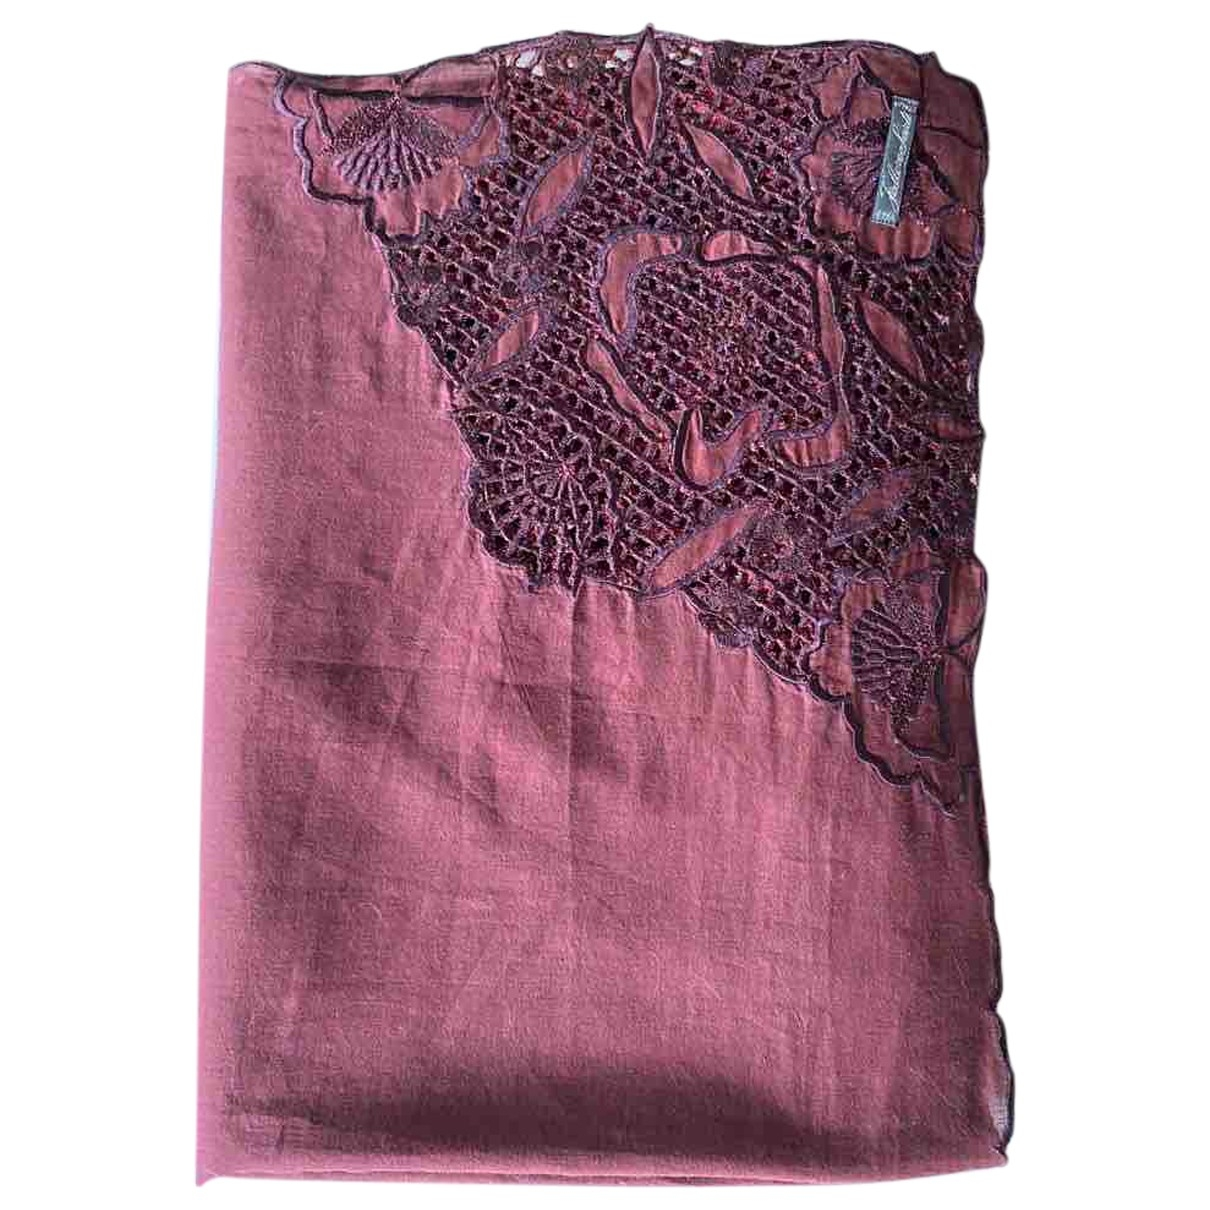 Faliero Sarti \N Burgundy Cotton scarf for Women \N